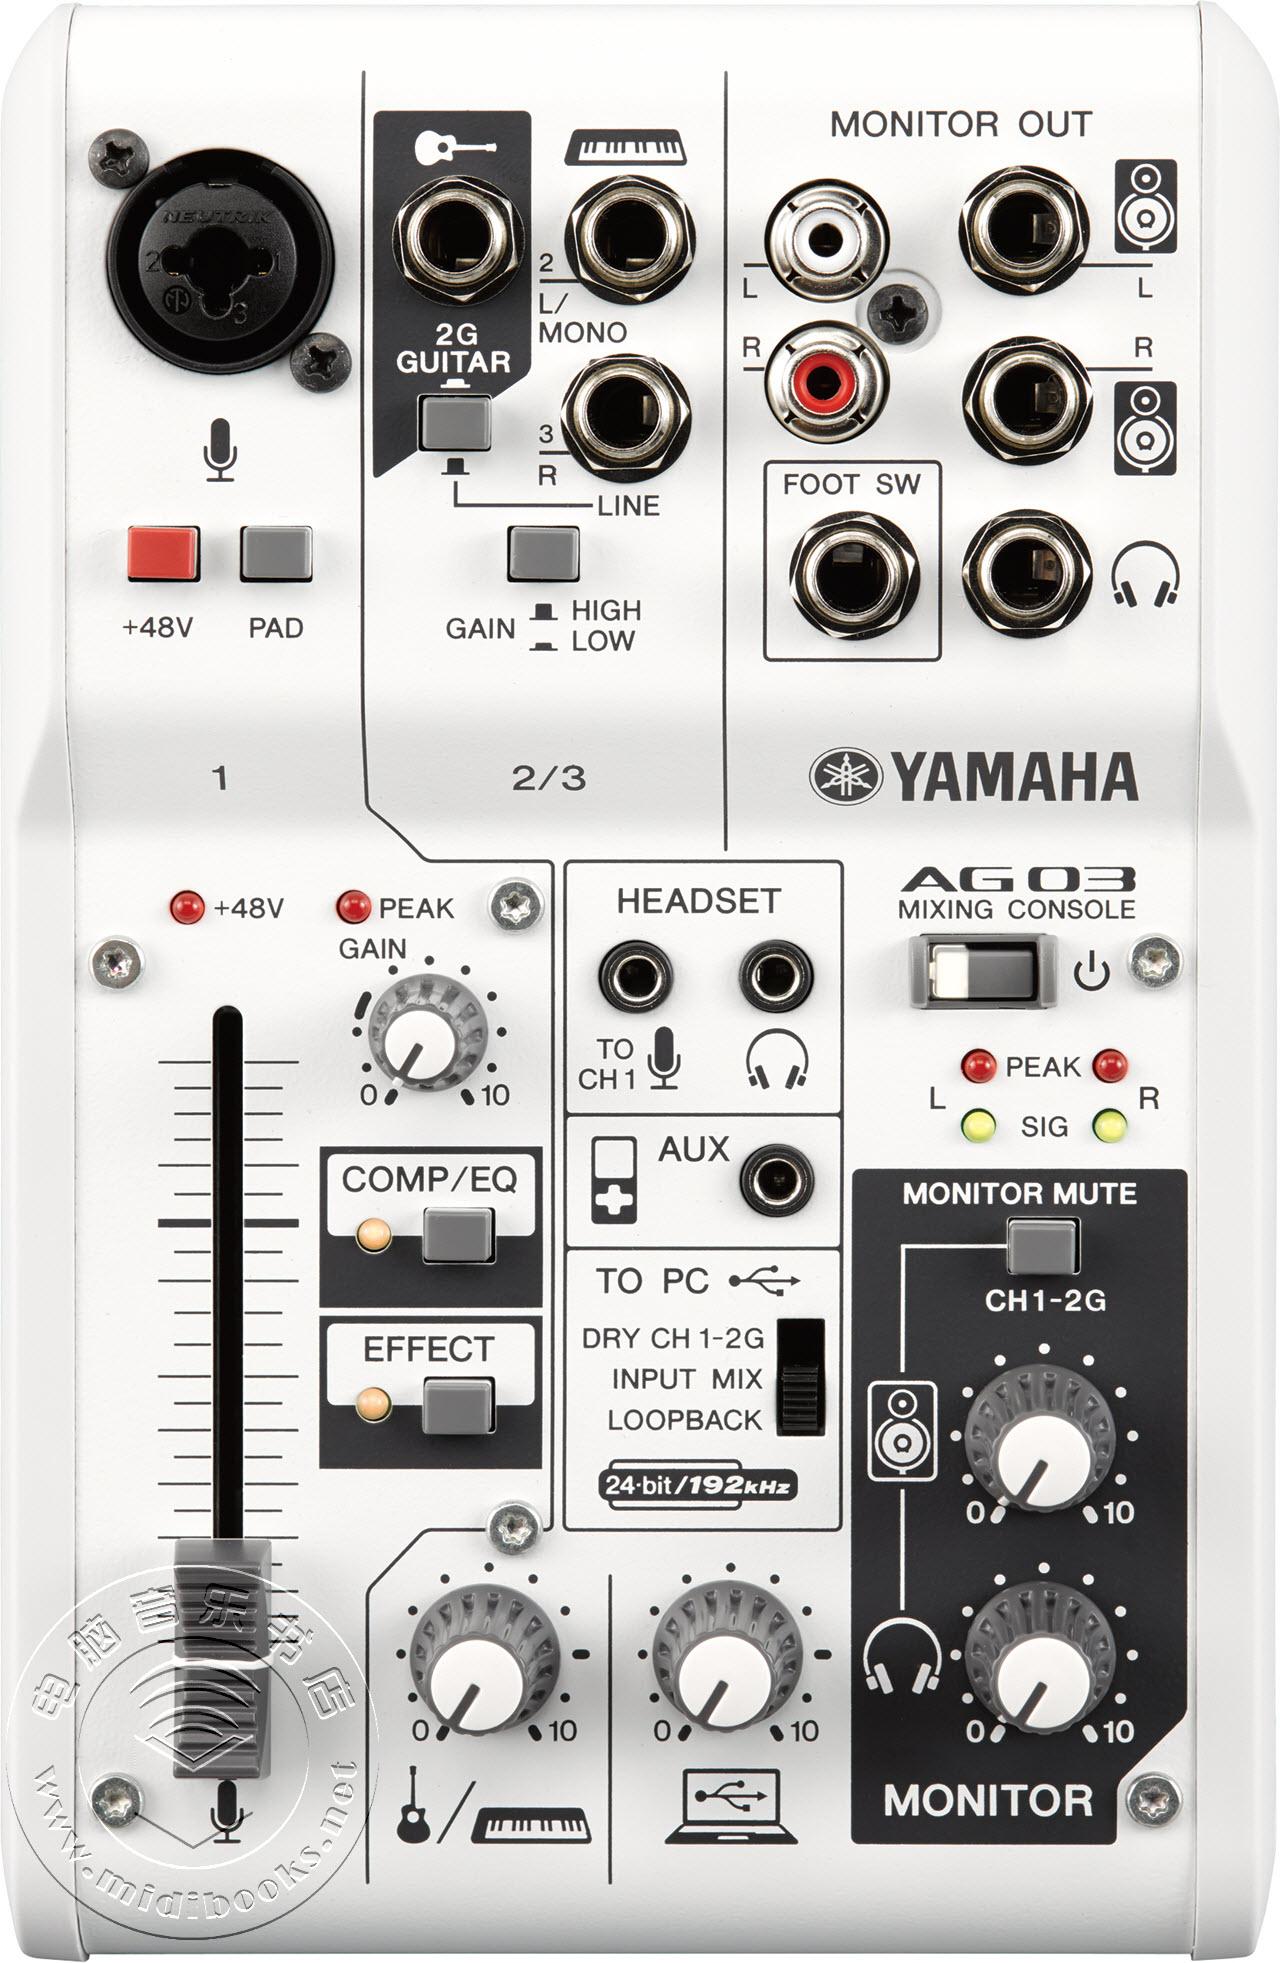 [NAMM2015]YAMAHA(雅马哈)发布AG系列混合调音台(视频)